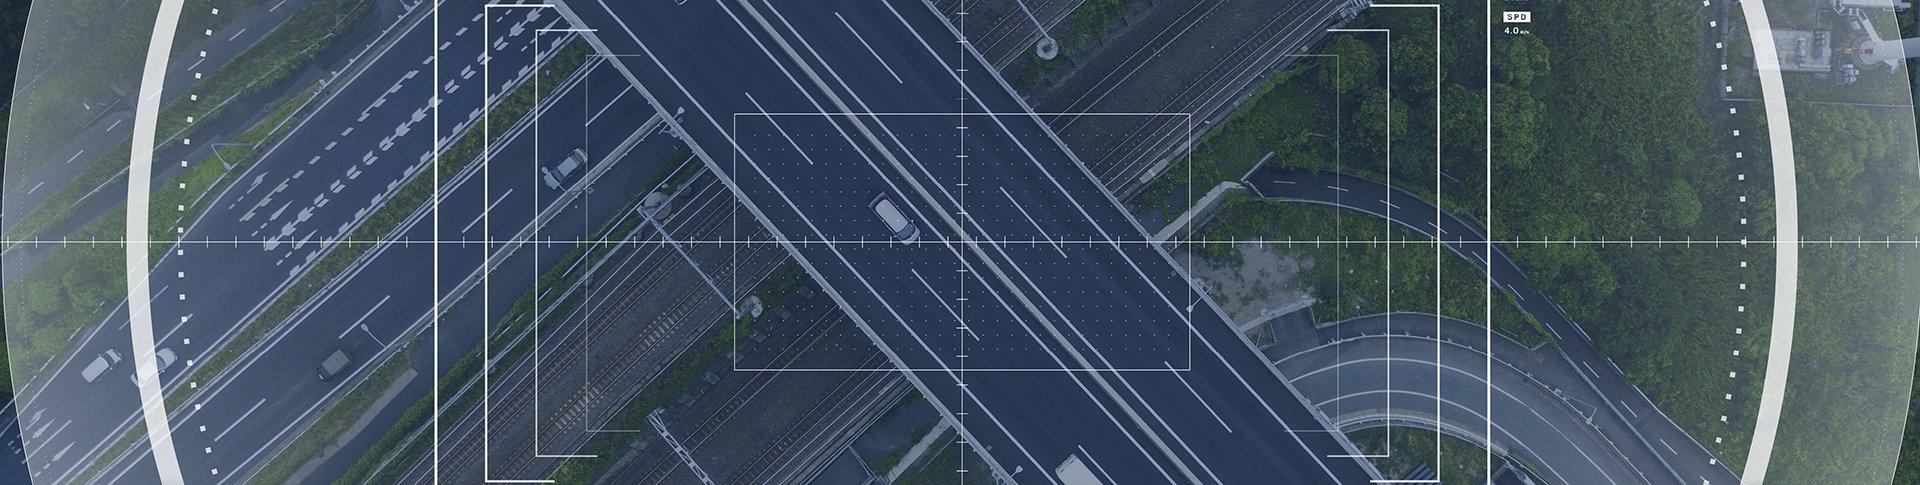 Autonomous flight